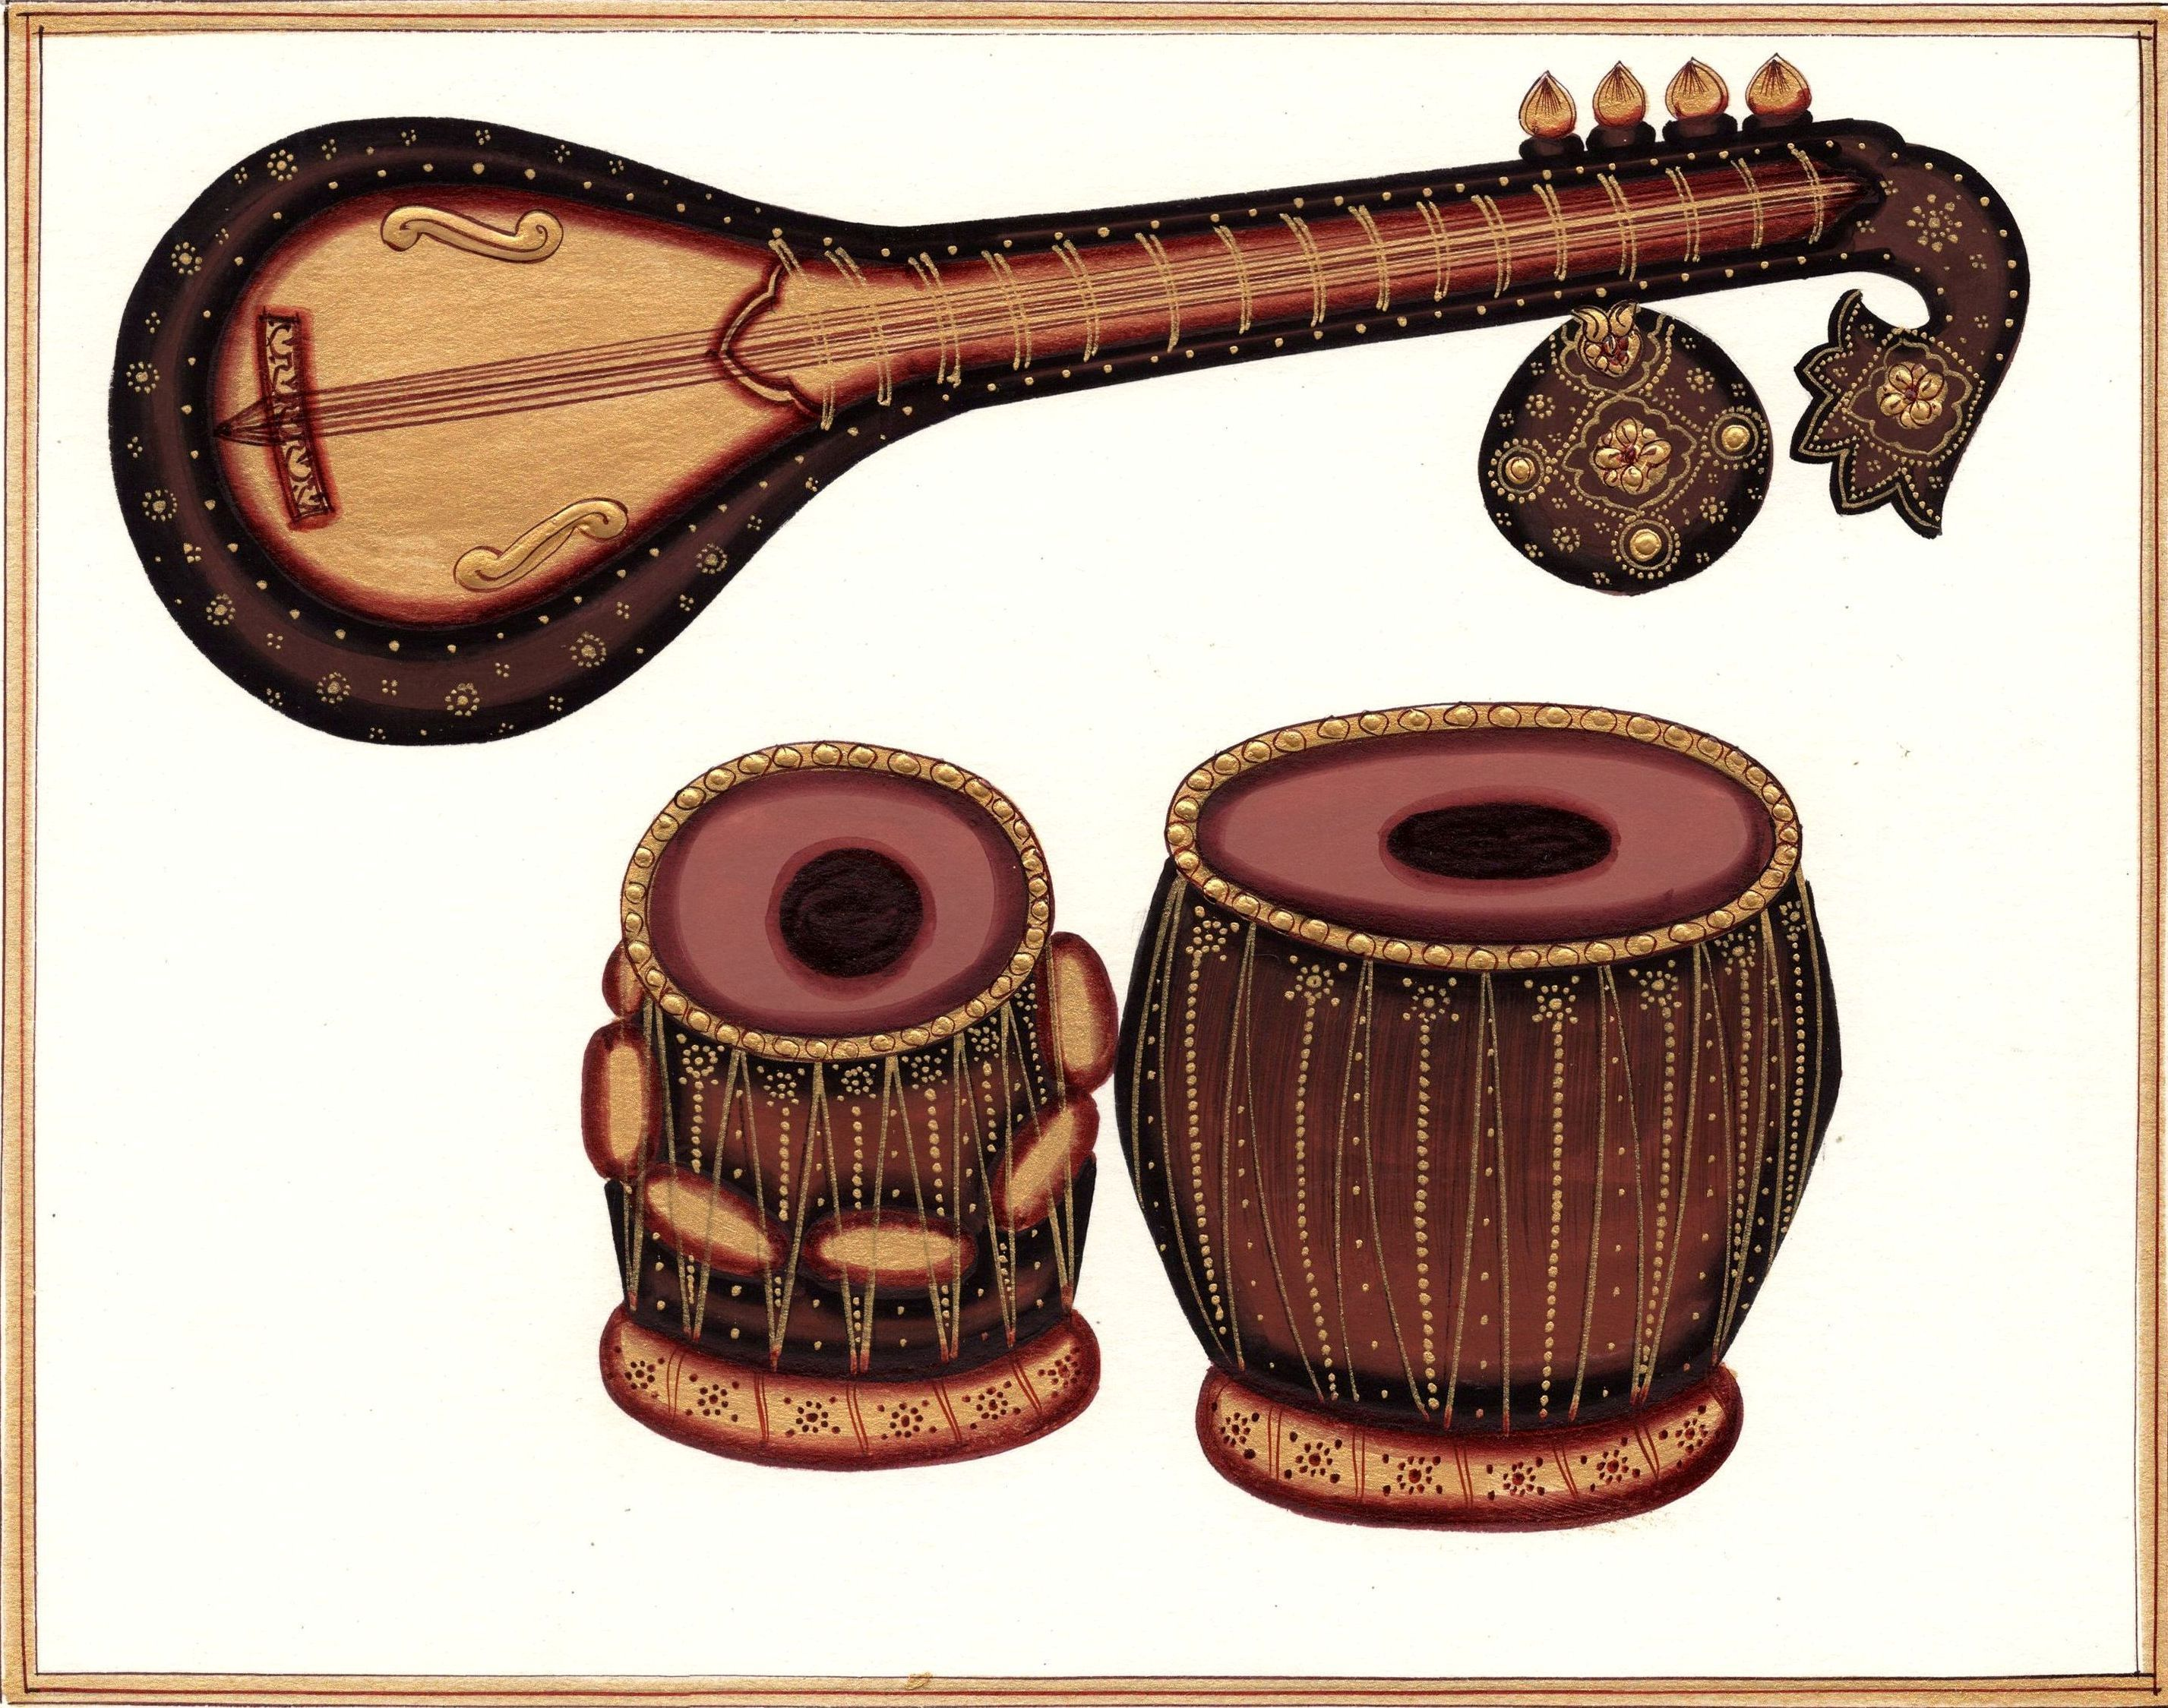 Banjo clipart saraswati veena. Indian miniature painting tabla